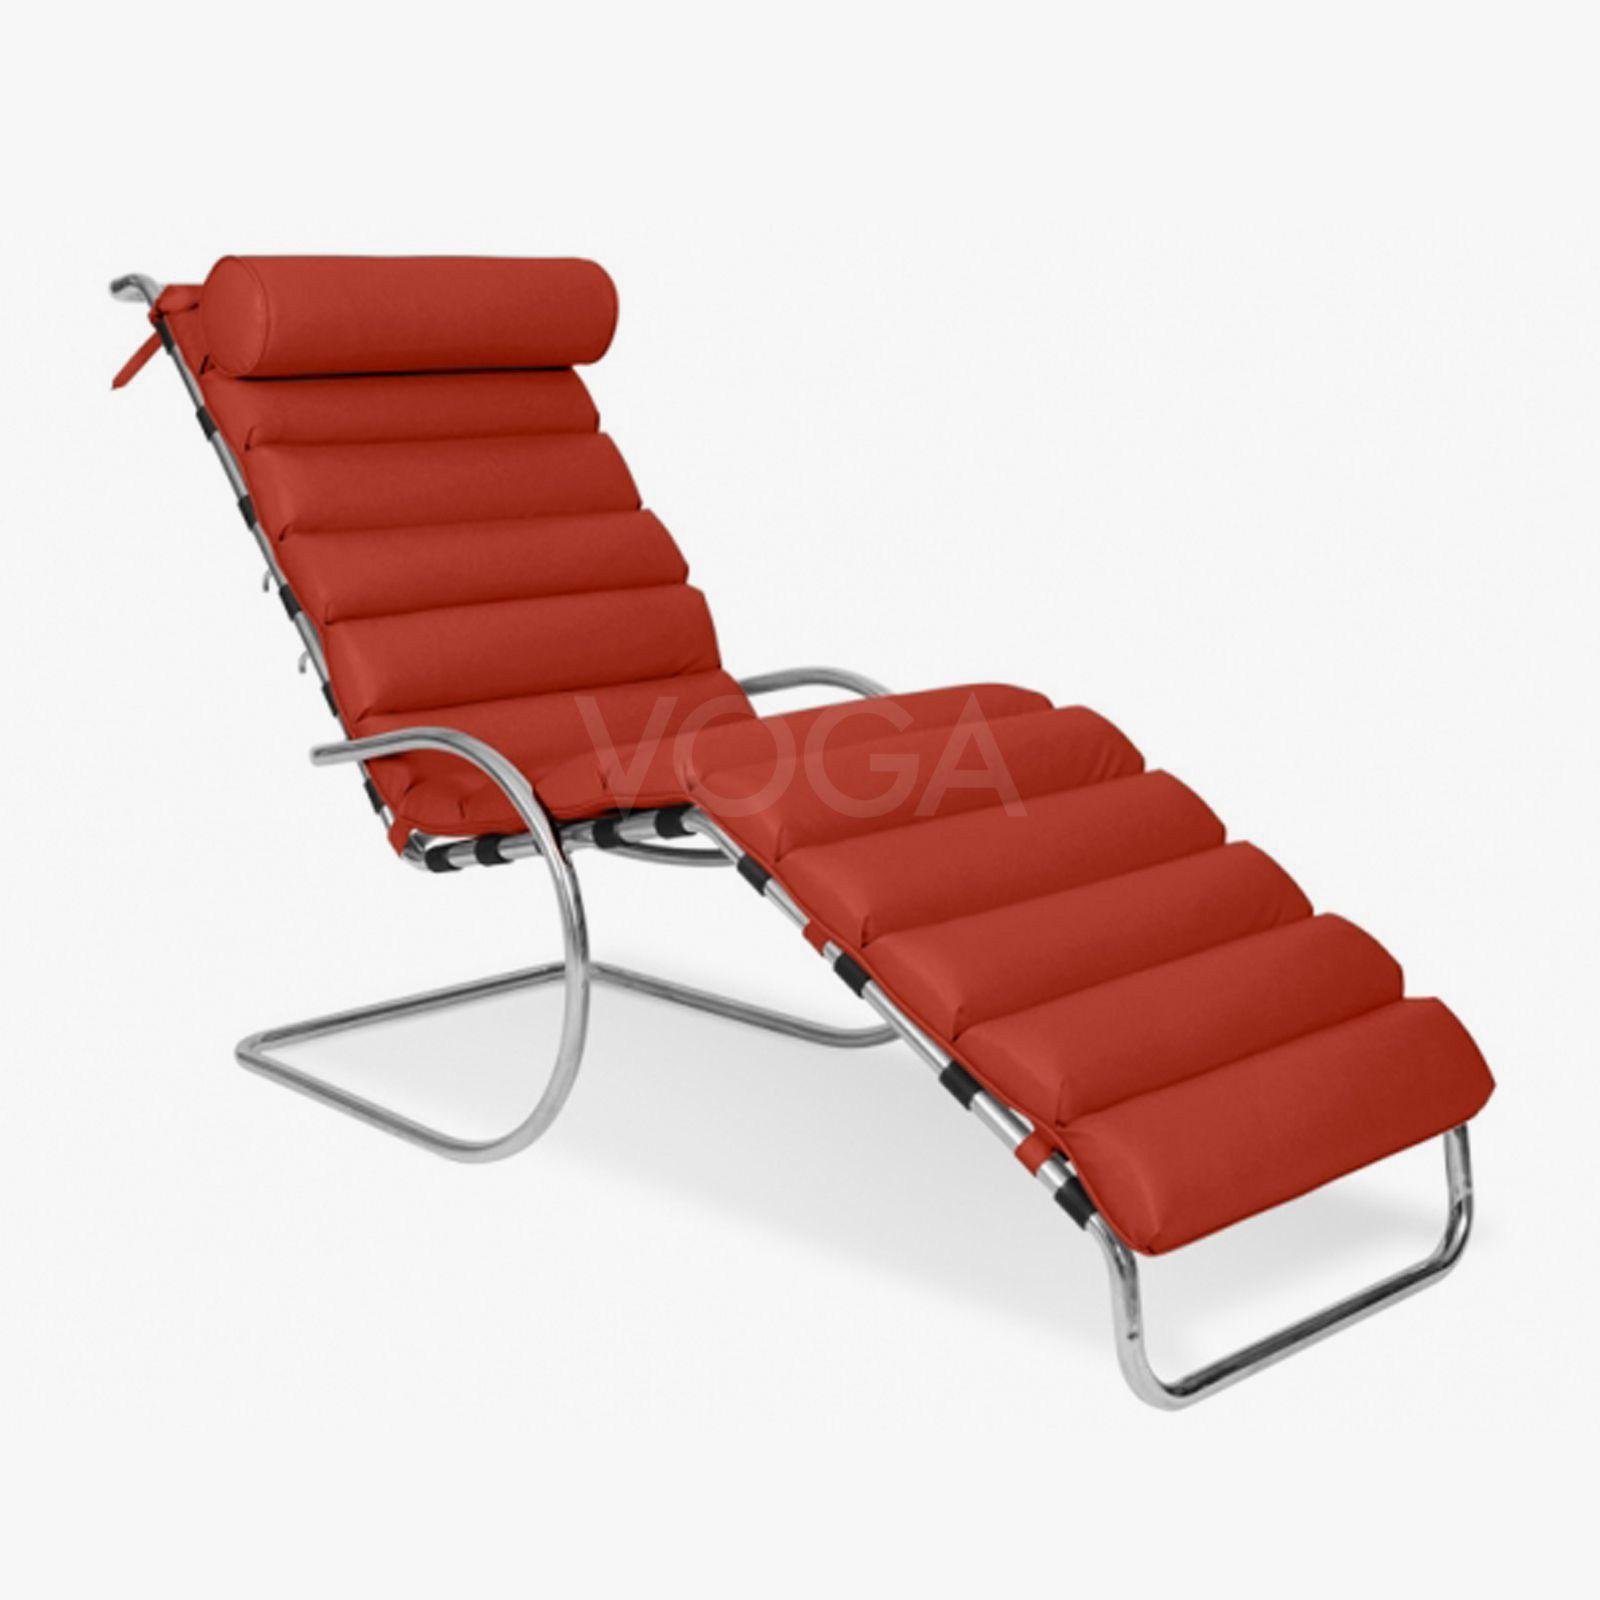 Design Ligstoel Leer.Mies Van Der Rohe Ligstoel Van Premium Leder Huisideeen